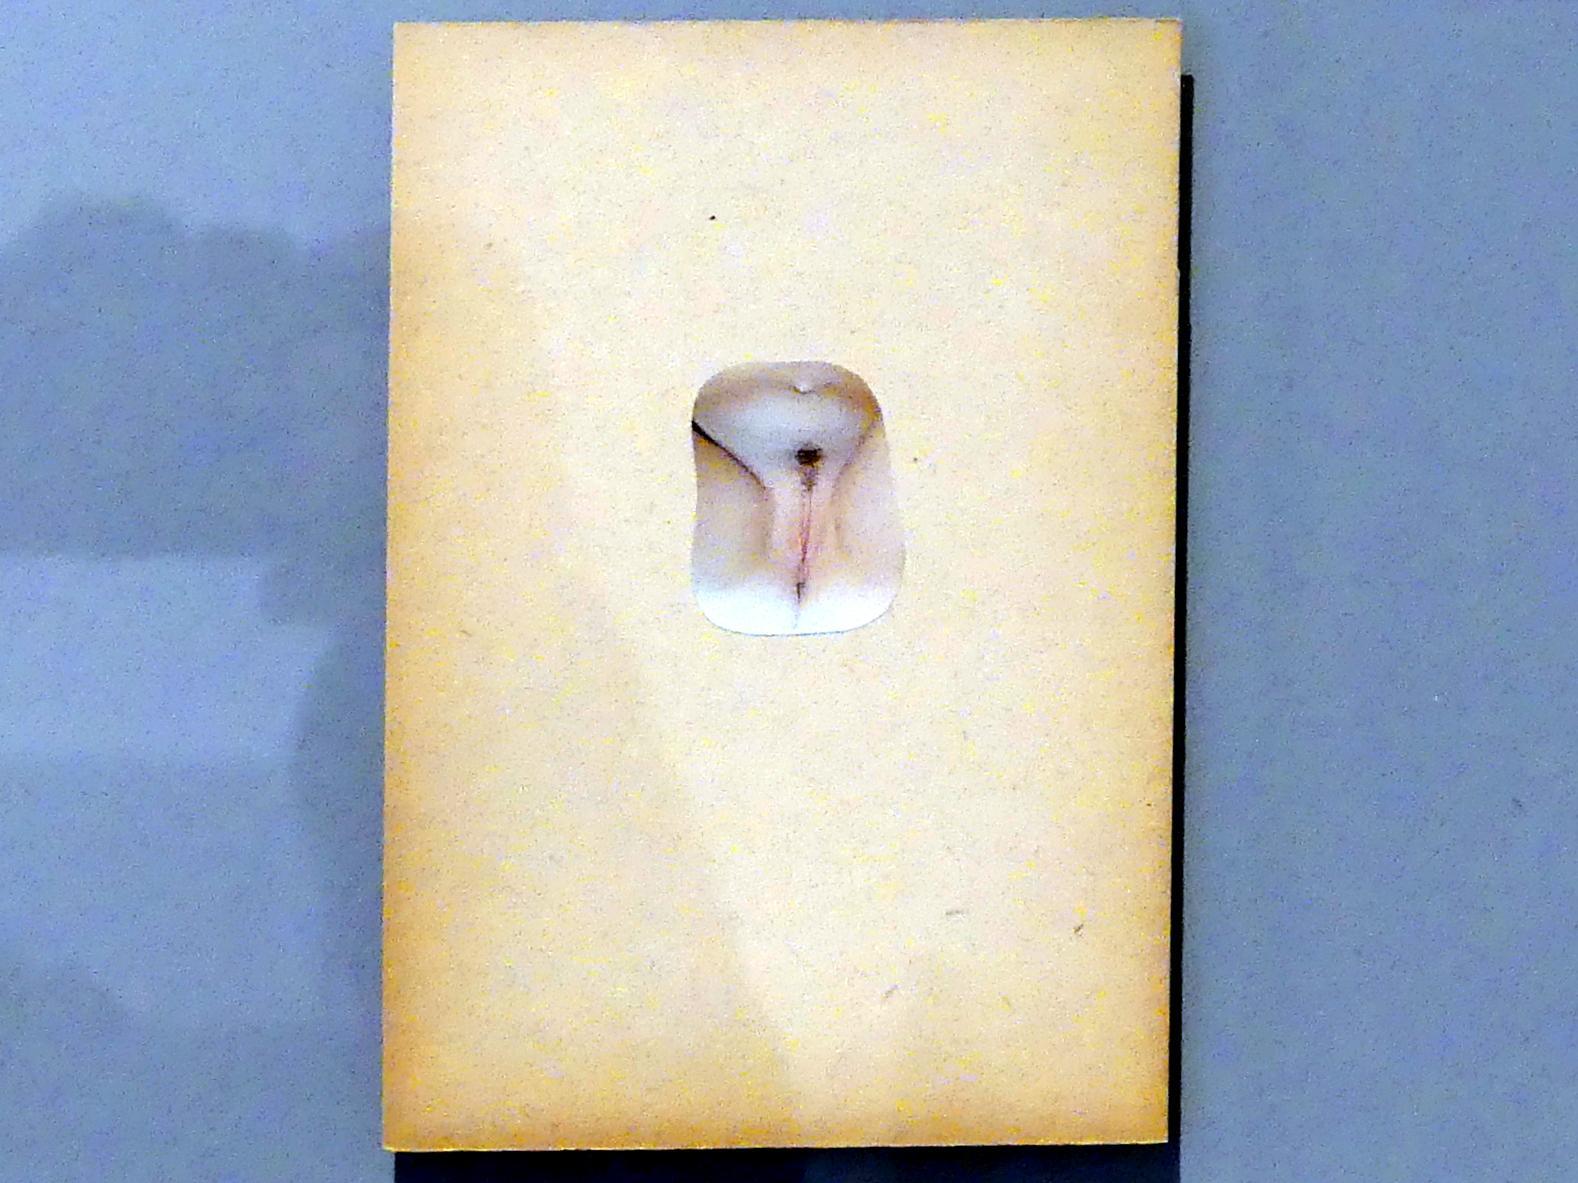 František Skála: Morgenlied, On the Road, Goldfische, Sonnenaufgang, Totem I, Hinter dem Vorhang, Reliquiar, 2000